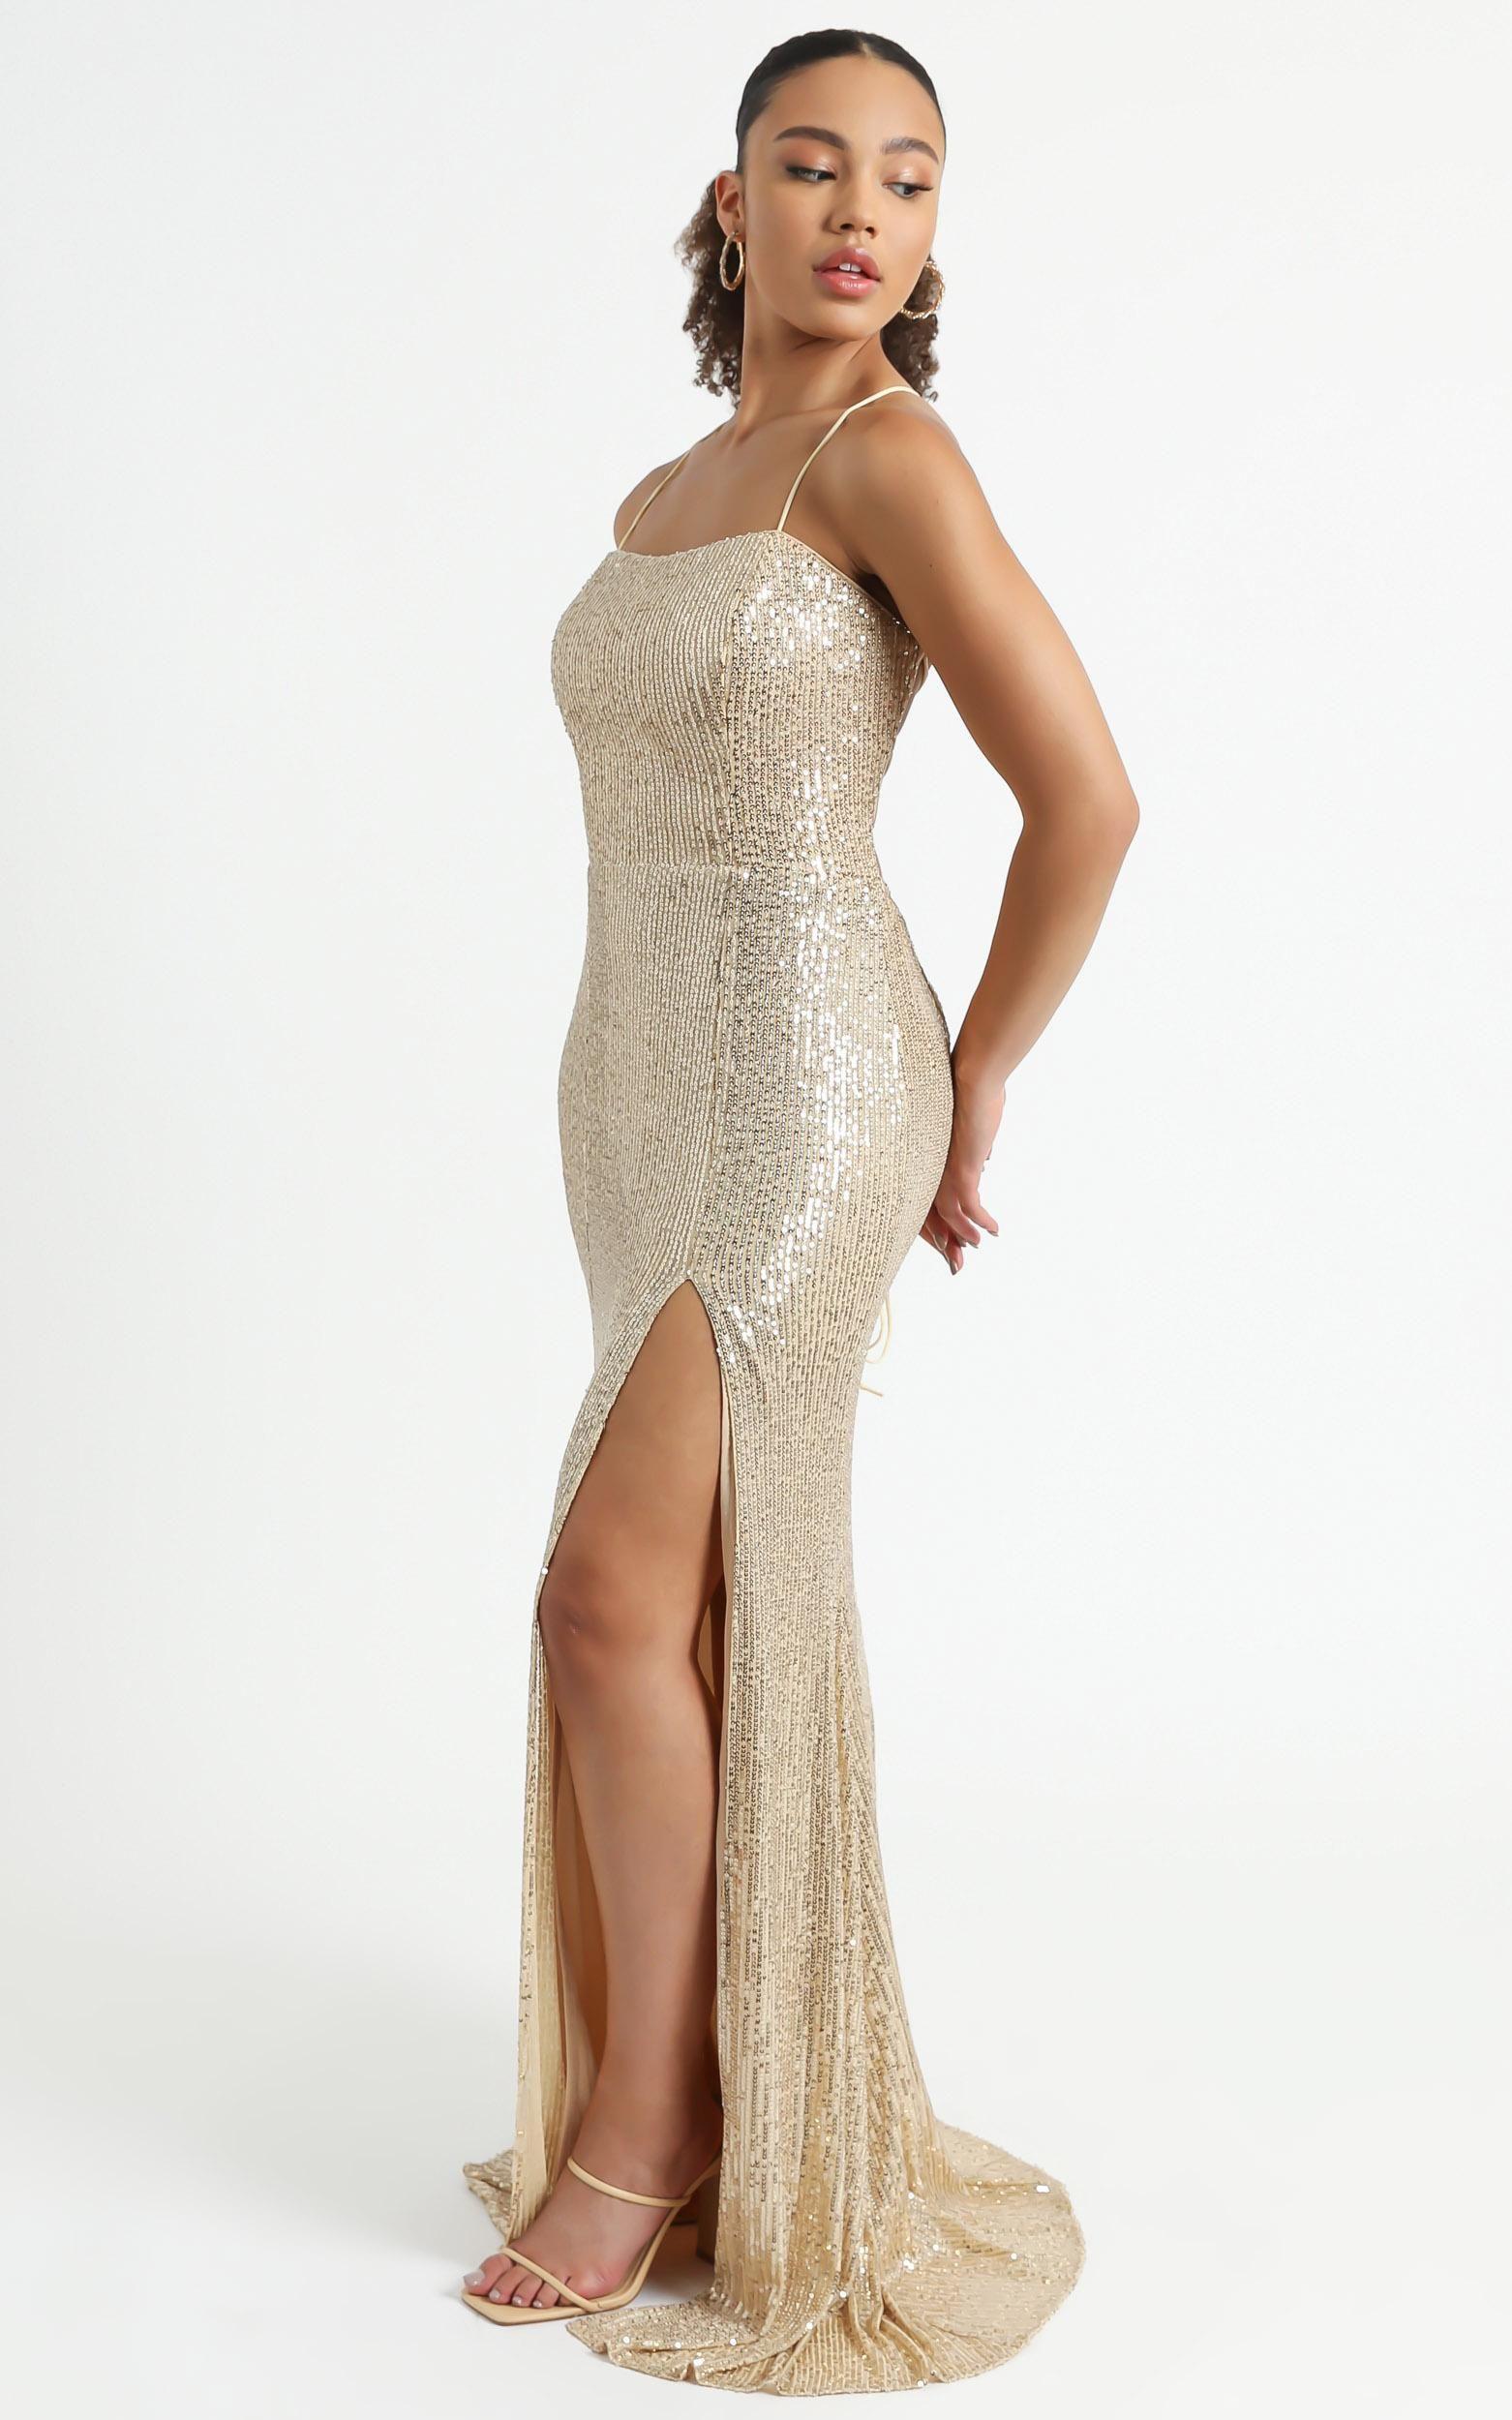 Magic Hour Maxi Dress In Gold Sequin Showpo In 2021 Dresses Maxi Dress Gold Sequin [ 2500 x 1562 Pixel ]